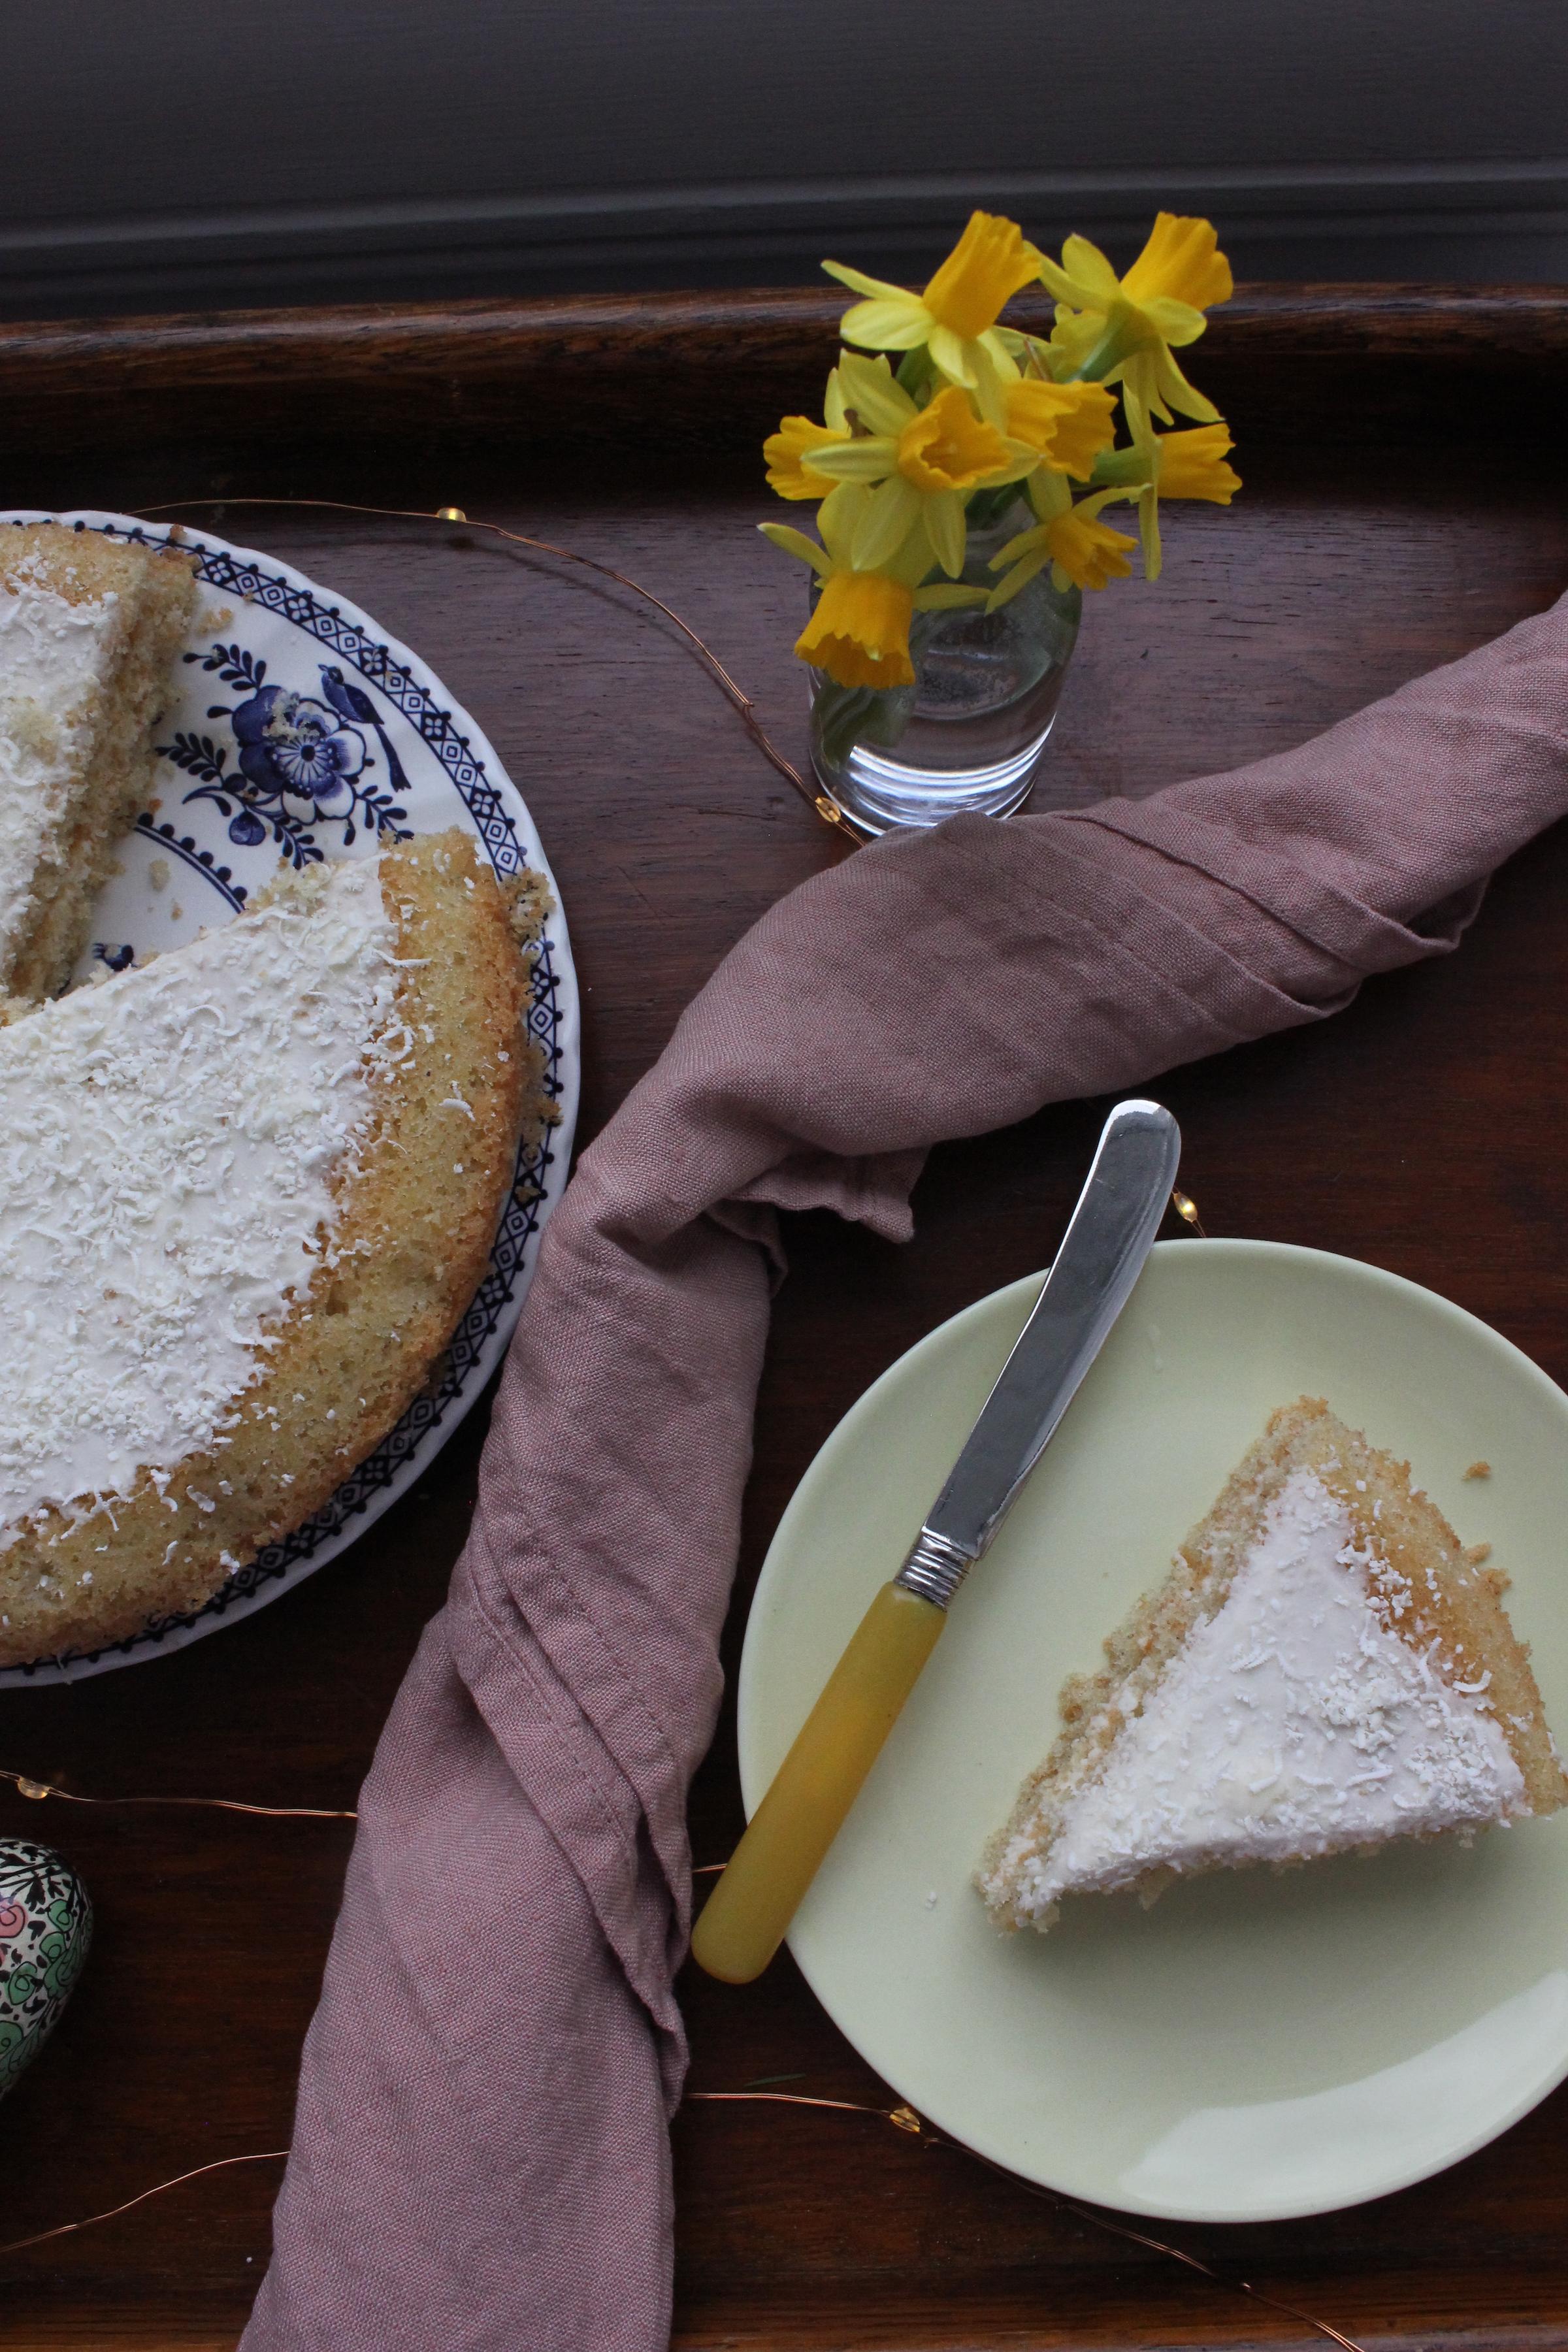 White chocolate and cardamom cake